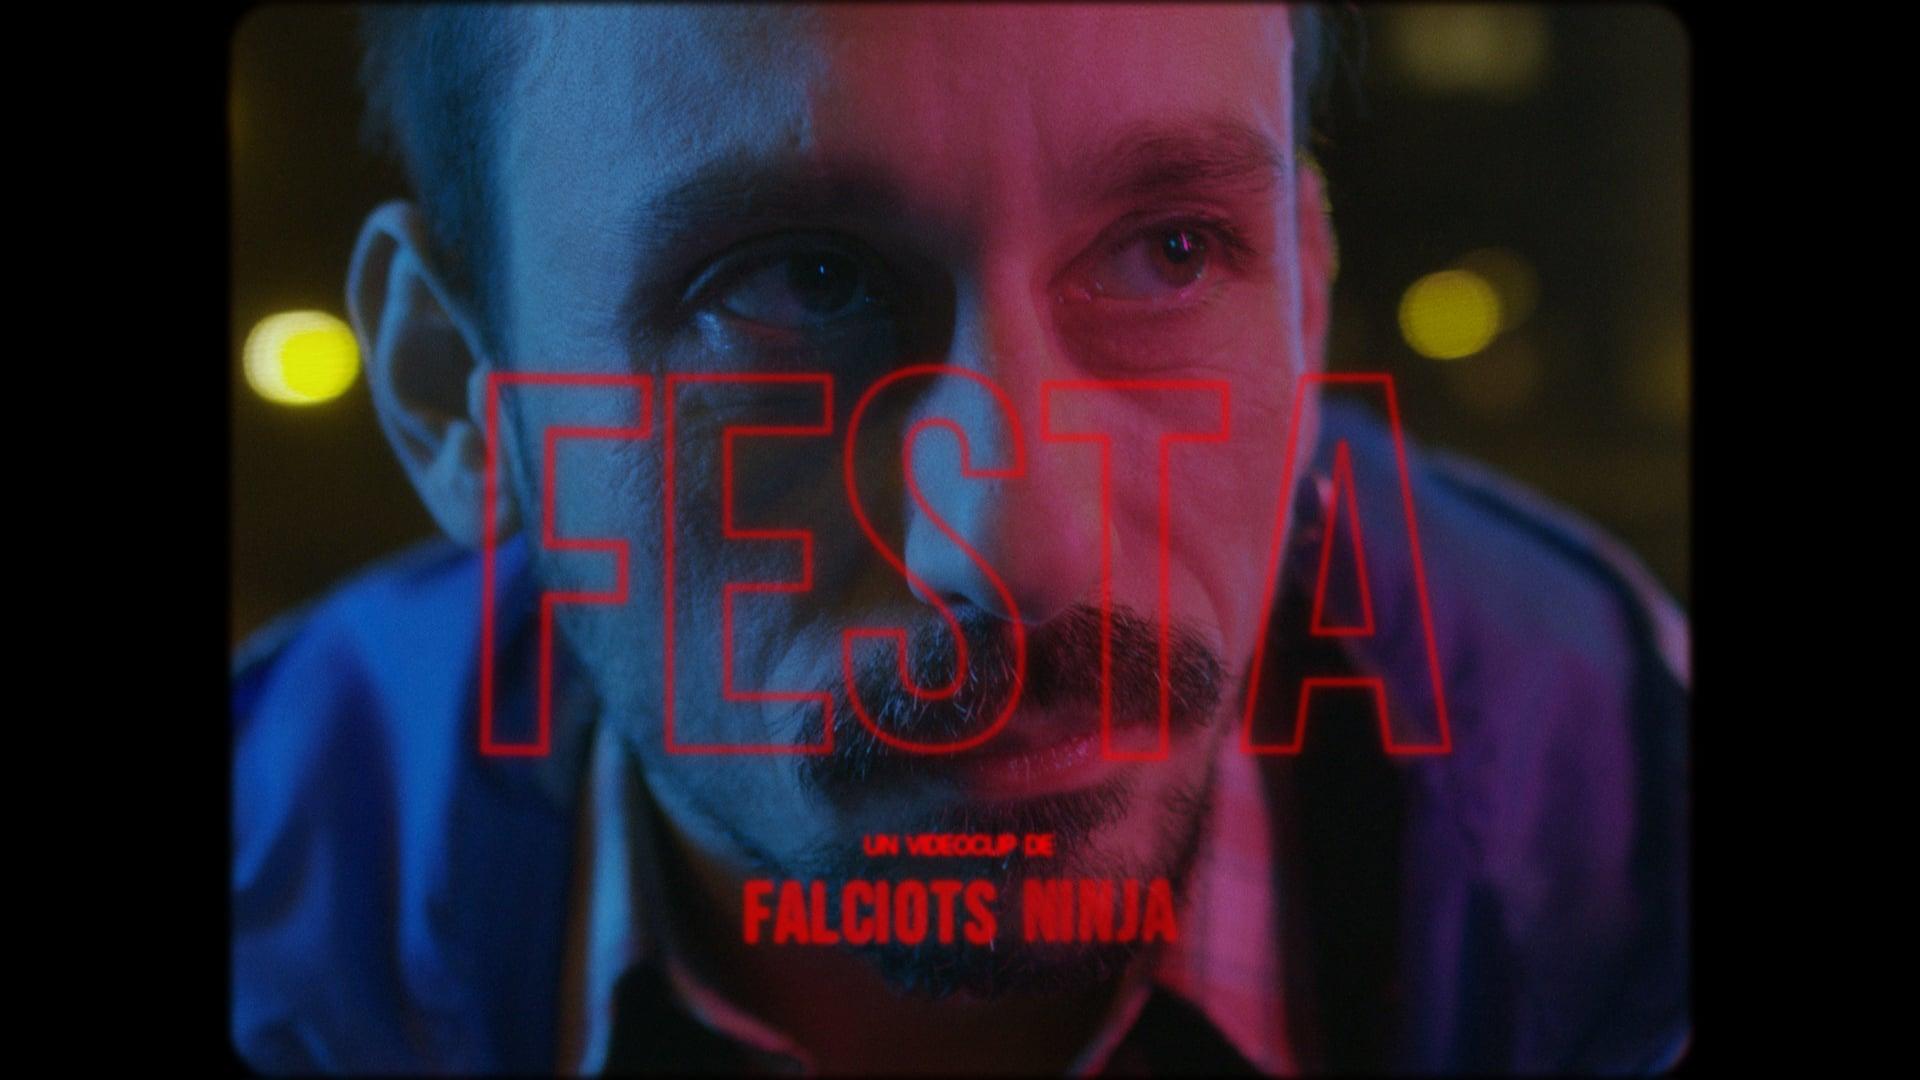 'Festa' - FALCIOTS NINJA